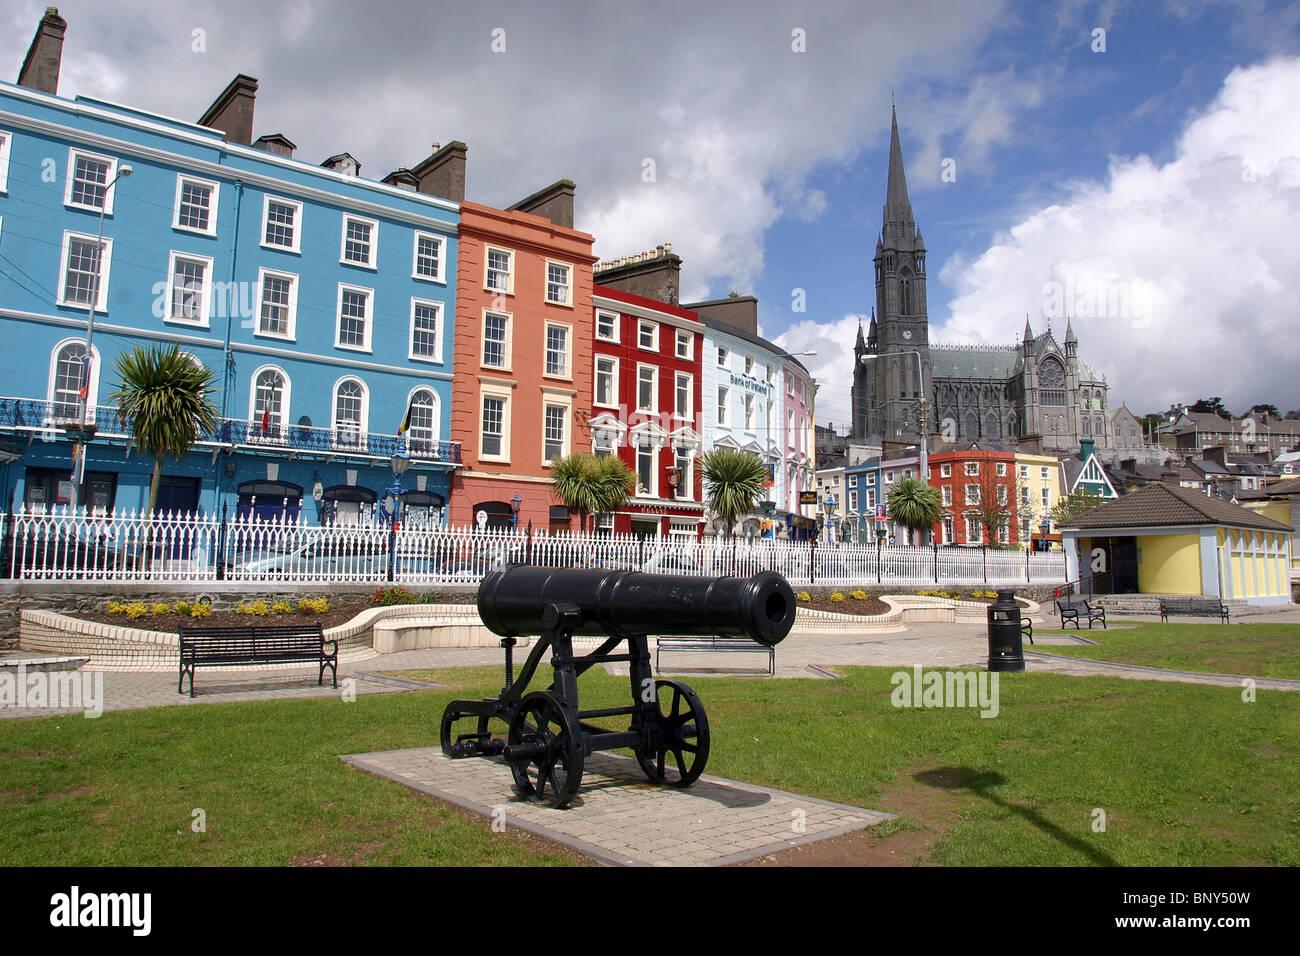 2020 Bisexual Chat Site in Ireland - brighten-up.uk